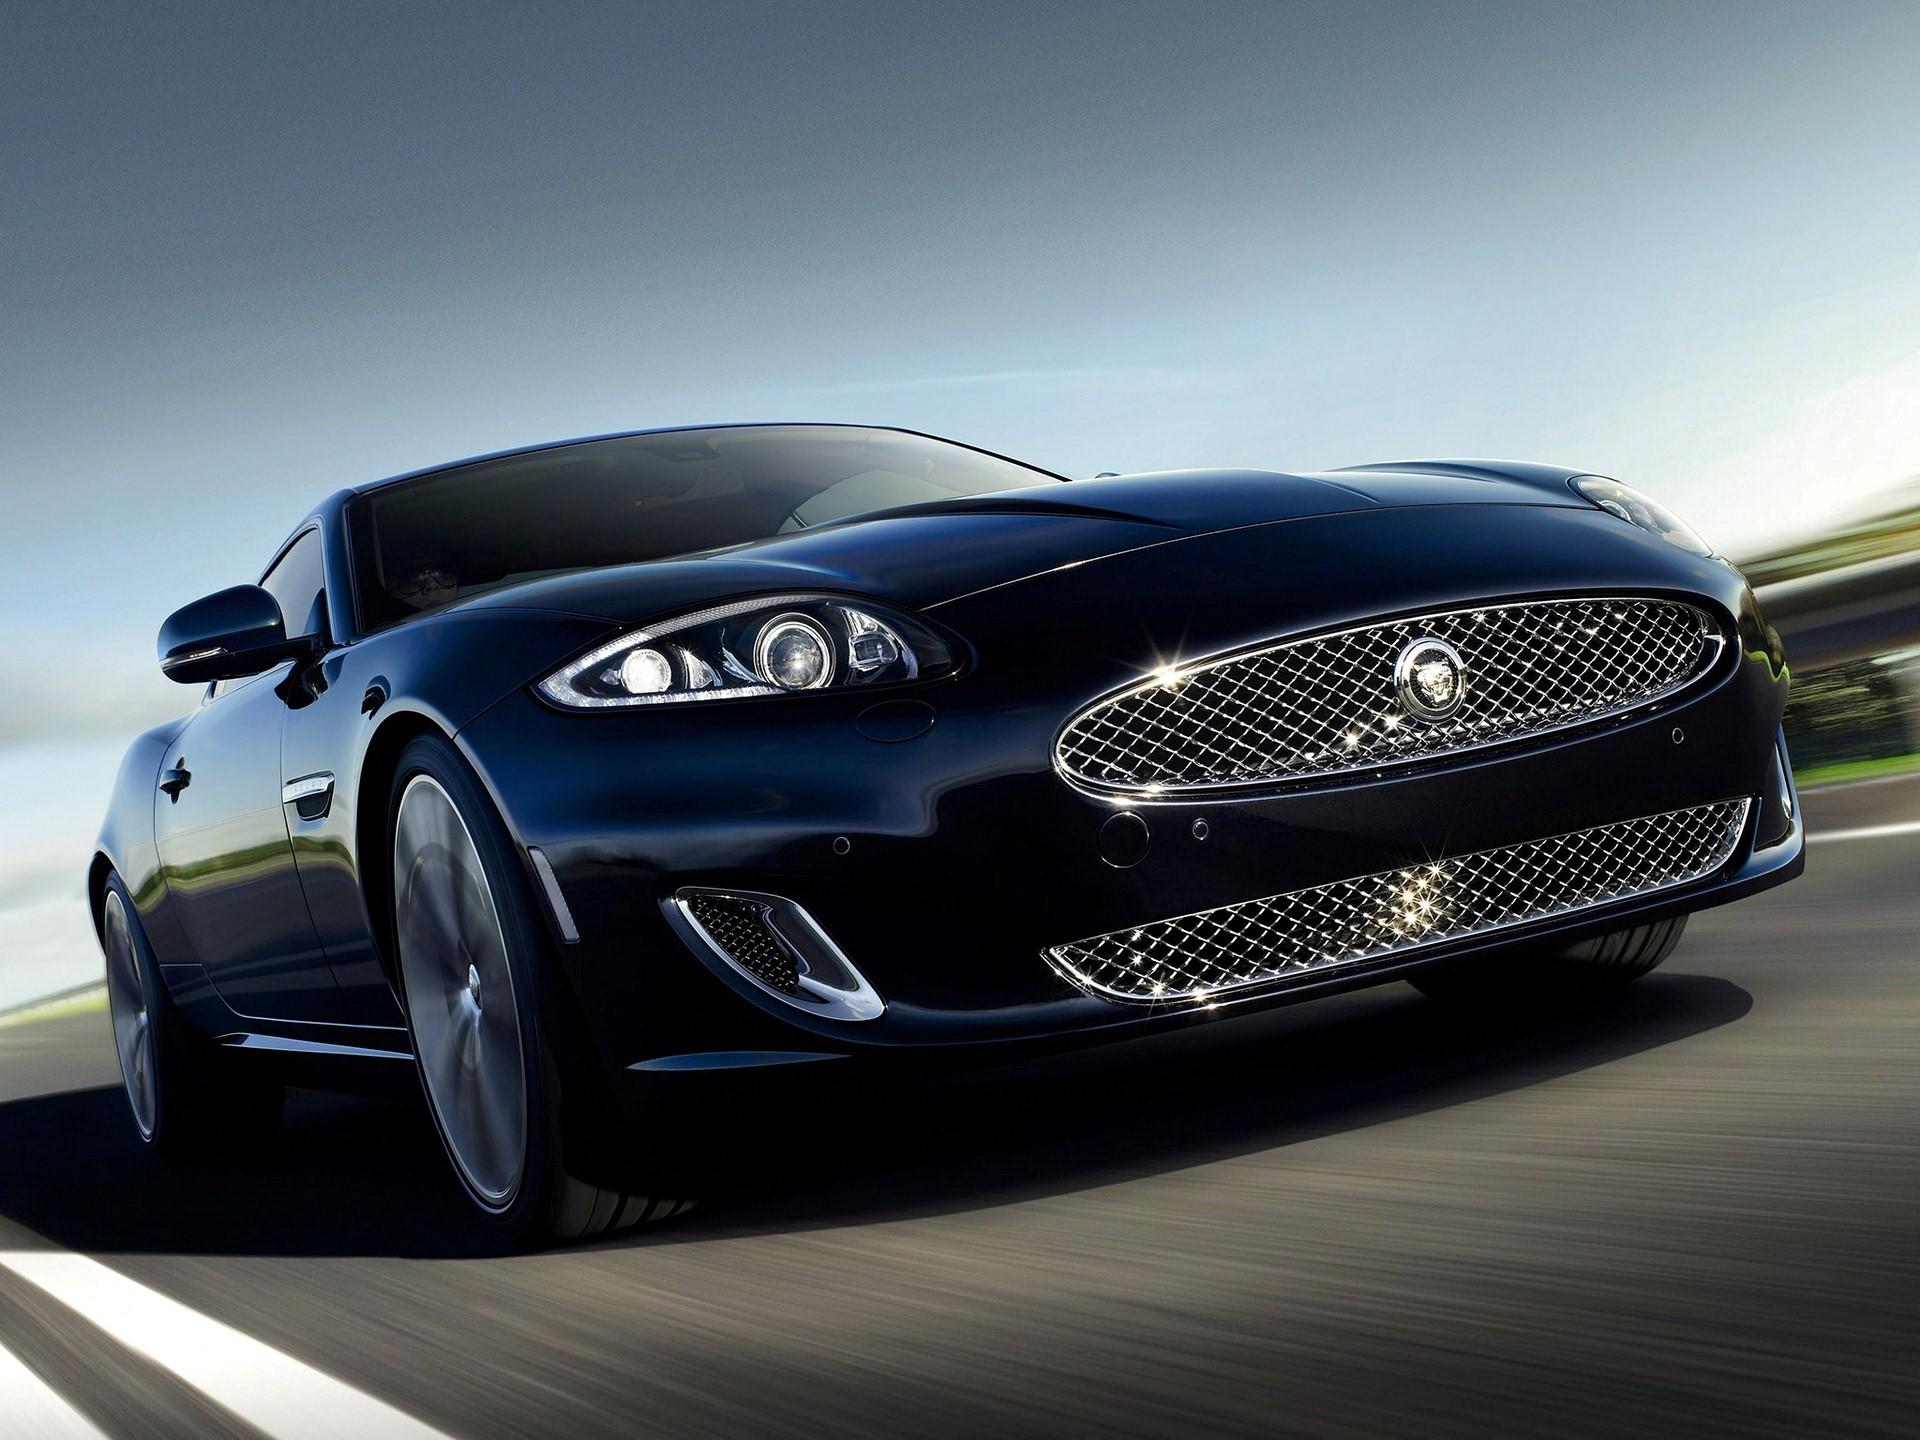 Jaguar Cars Images Hd: Jaguar Car Wallpaper Wallpapers High Quality